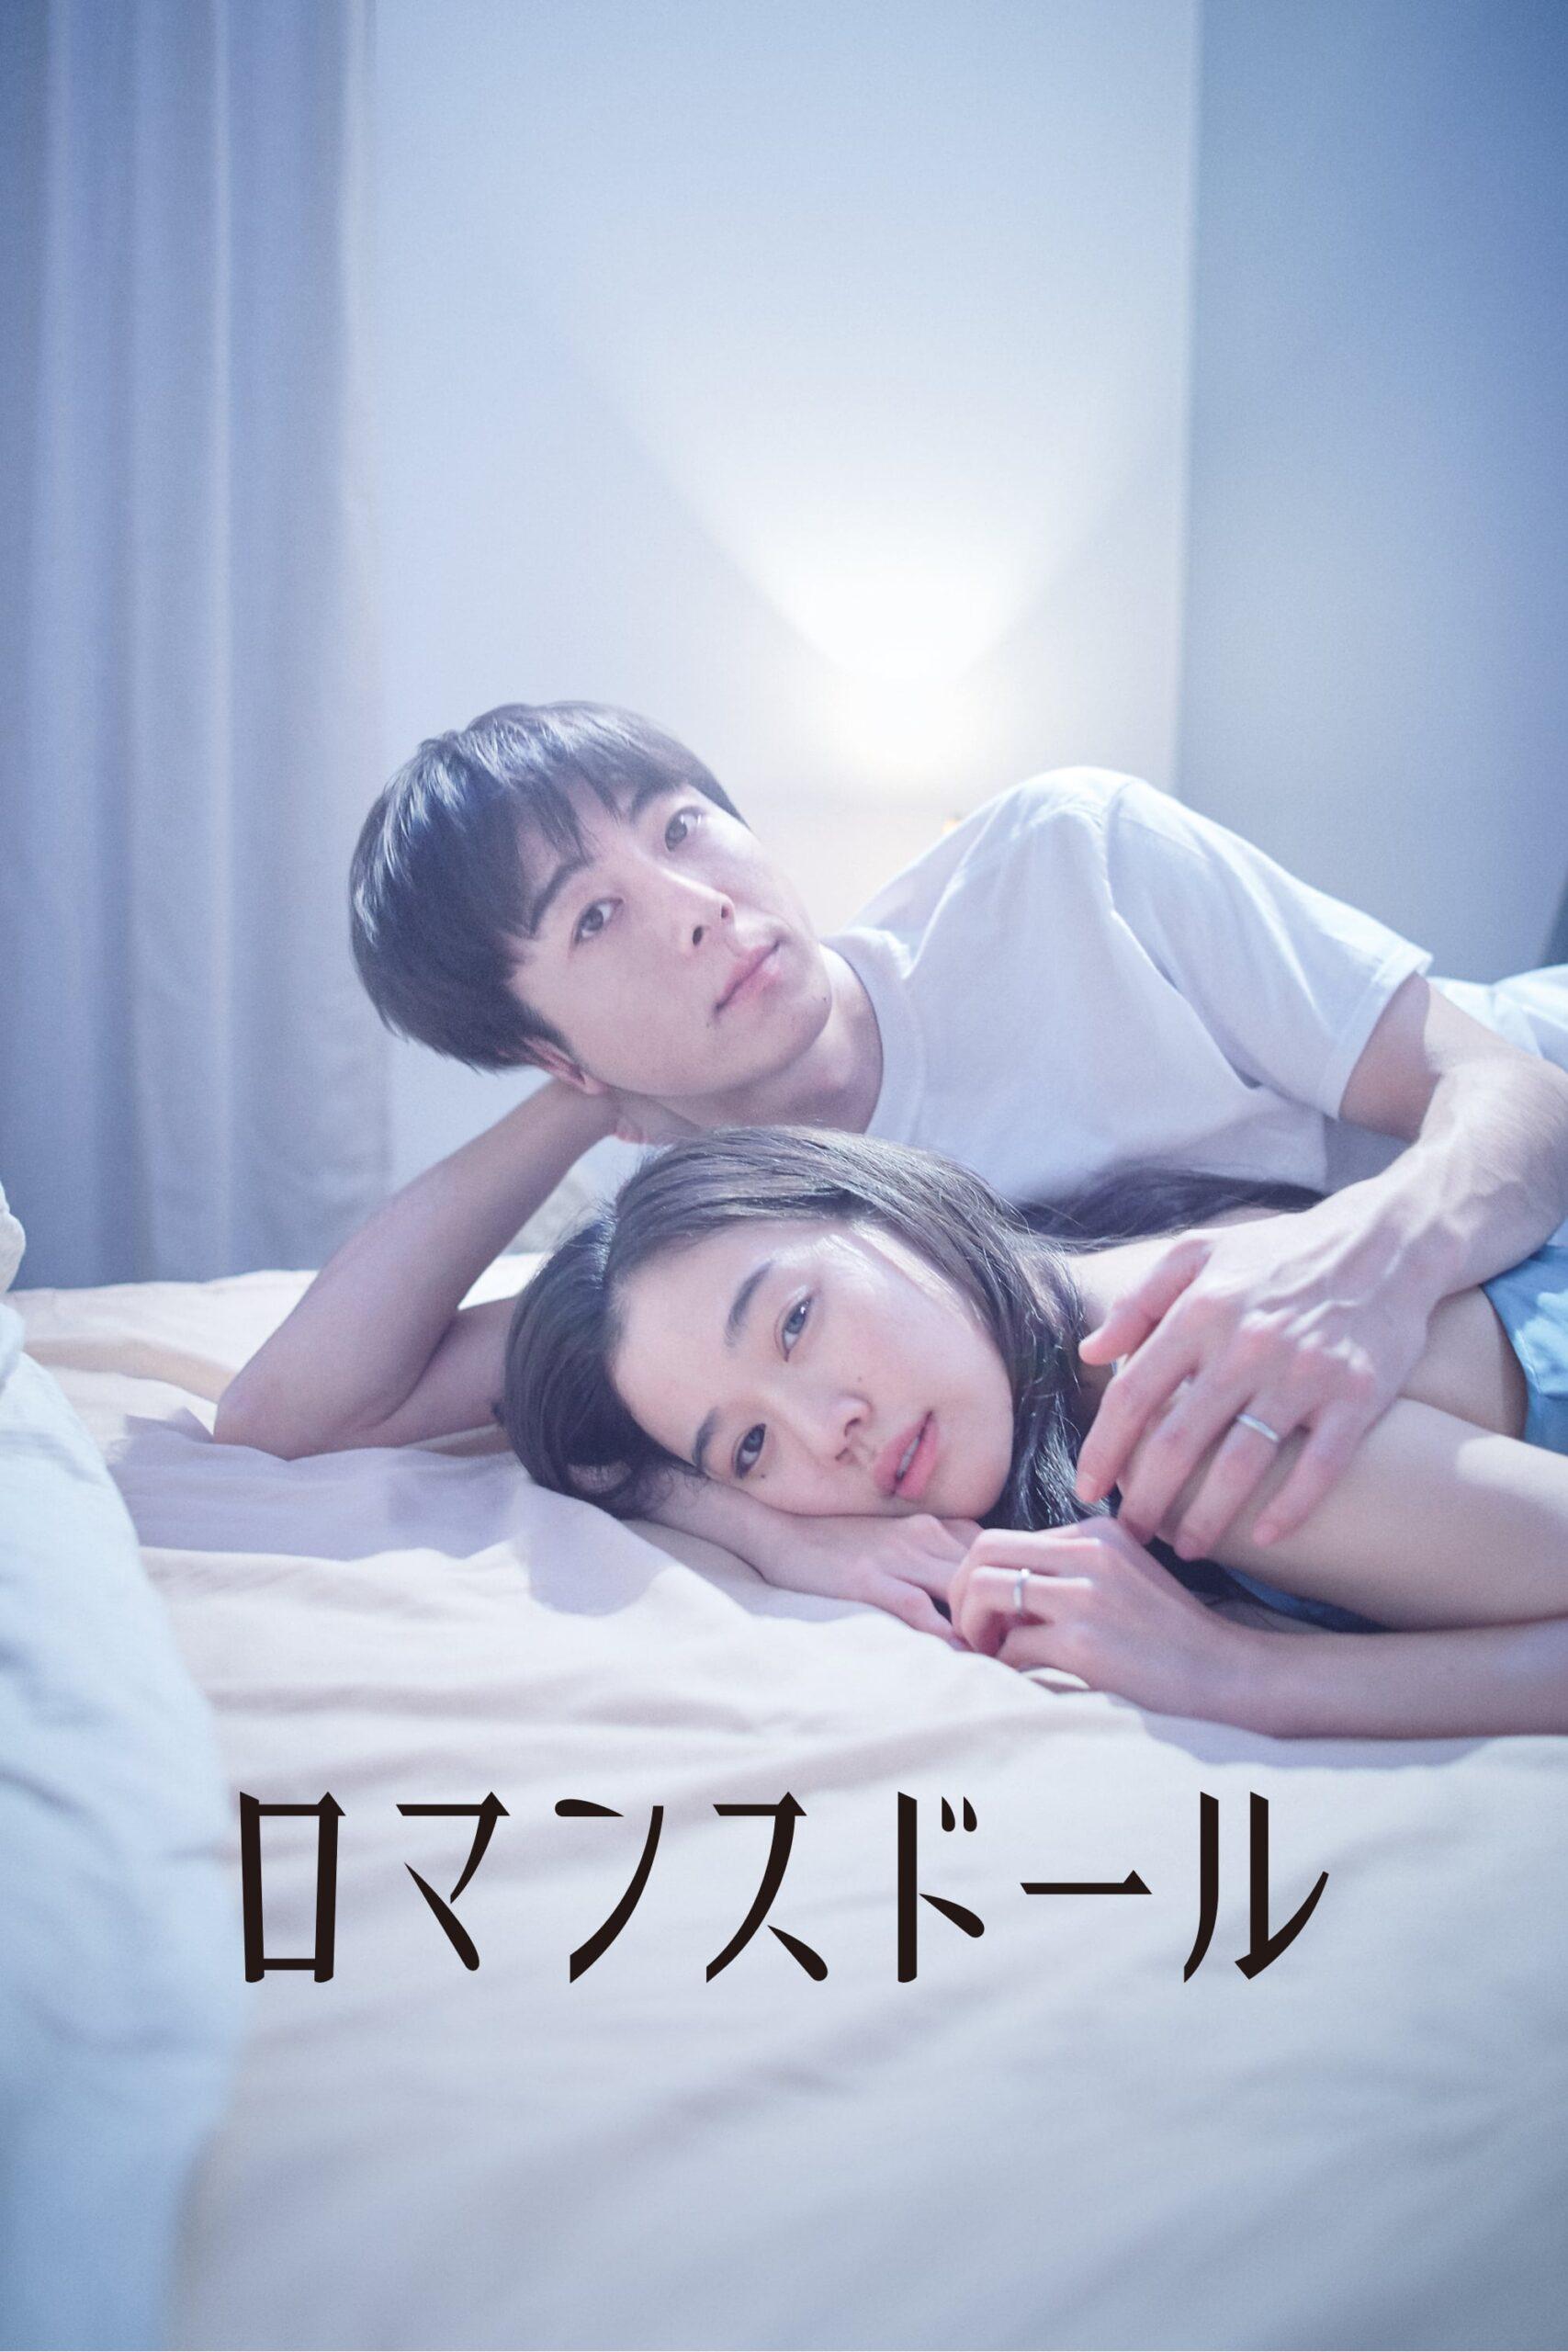 Romance Doll Movie Streaming Online Watch on Netflix